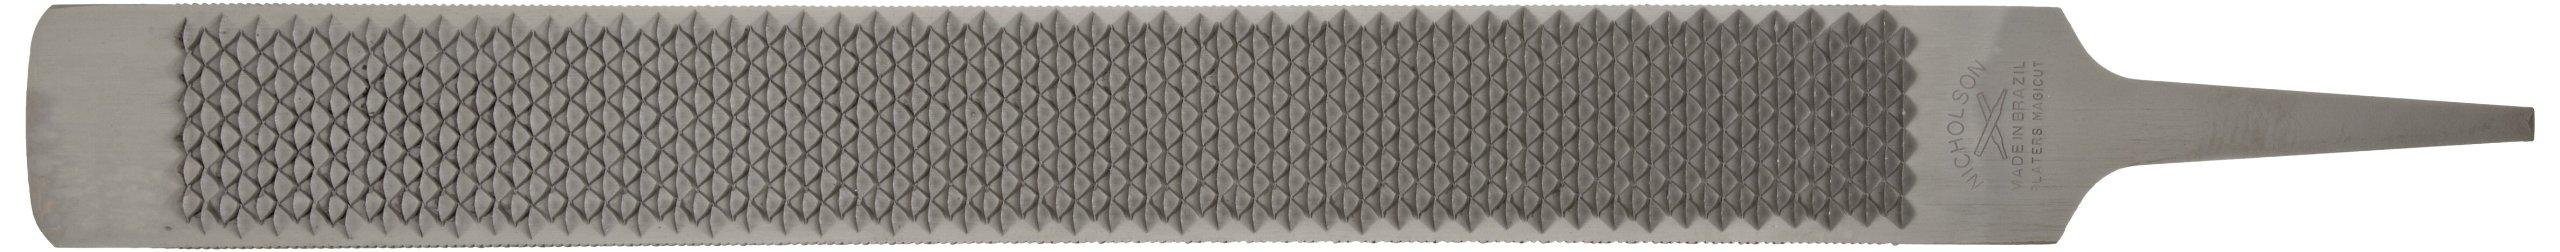 Nicholson Combination Magicut/Rasp File, American Pattern,  Rectangular, 14'' Length